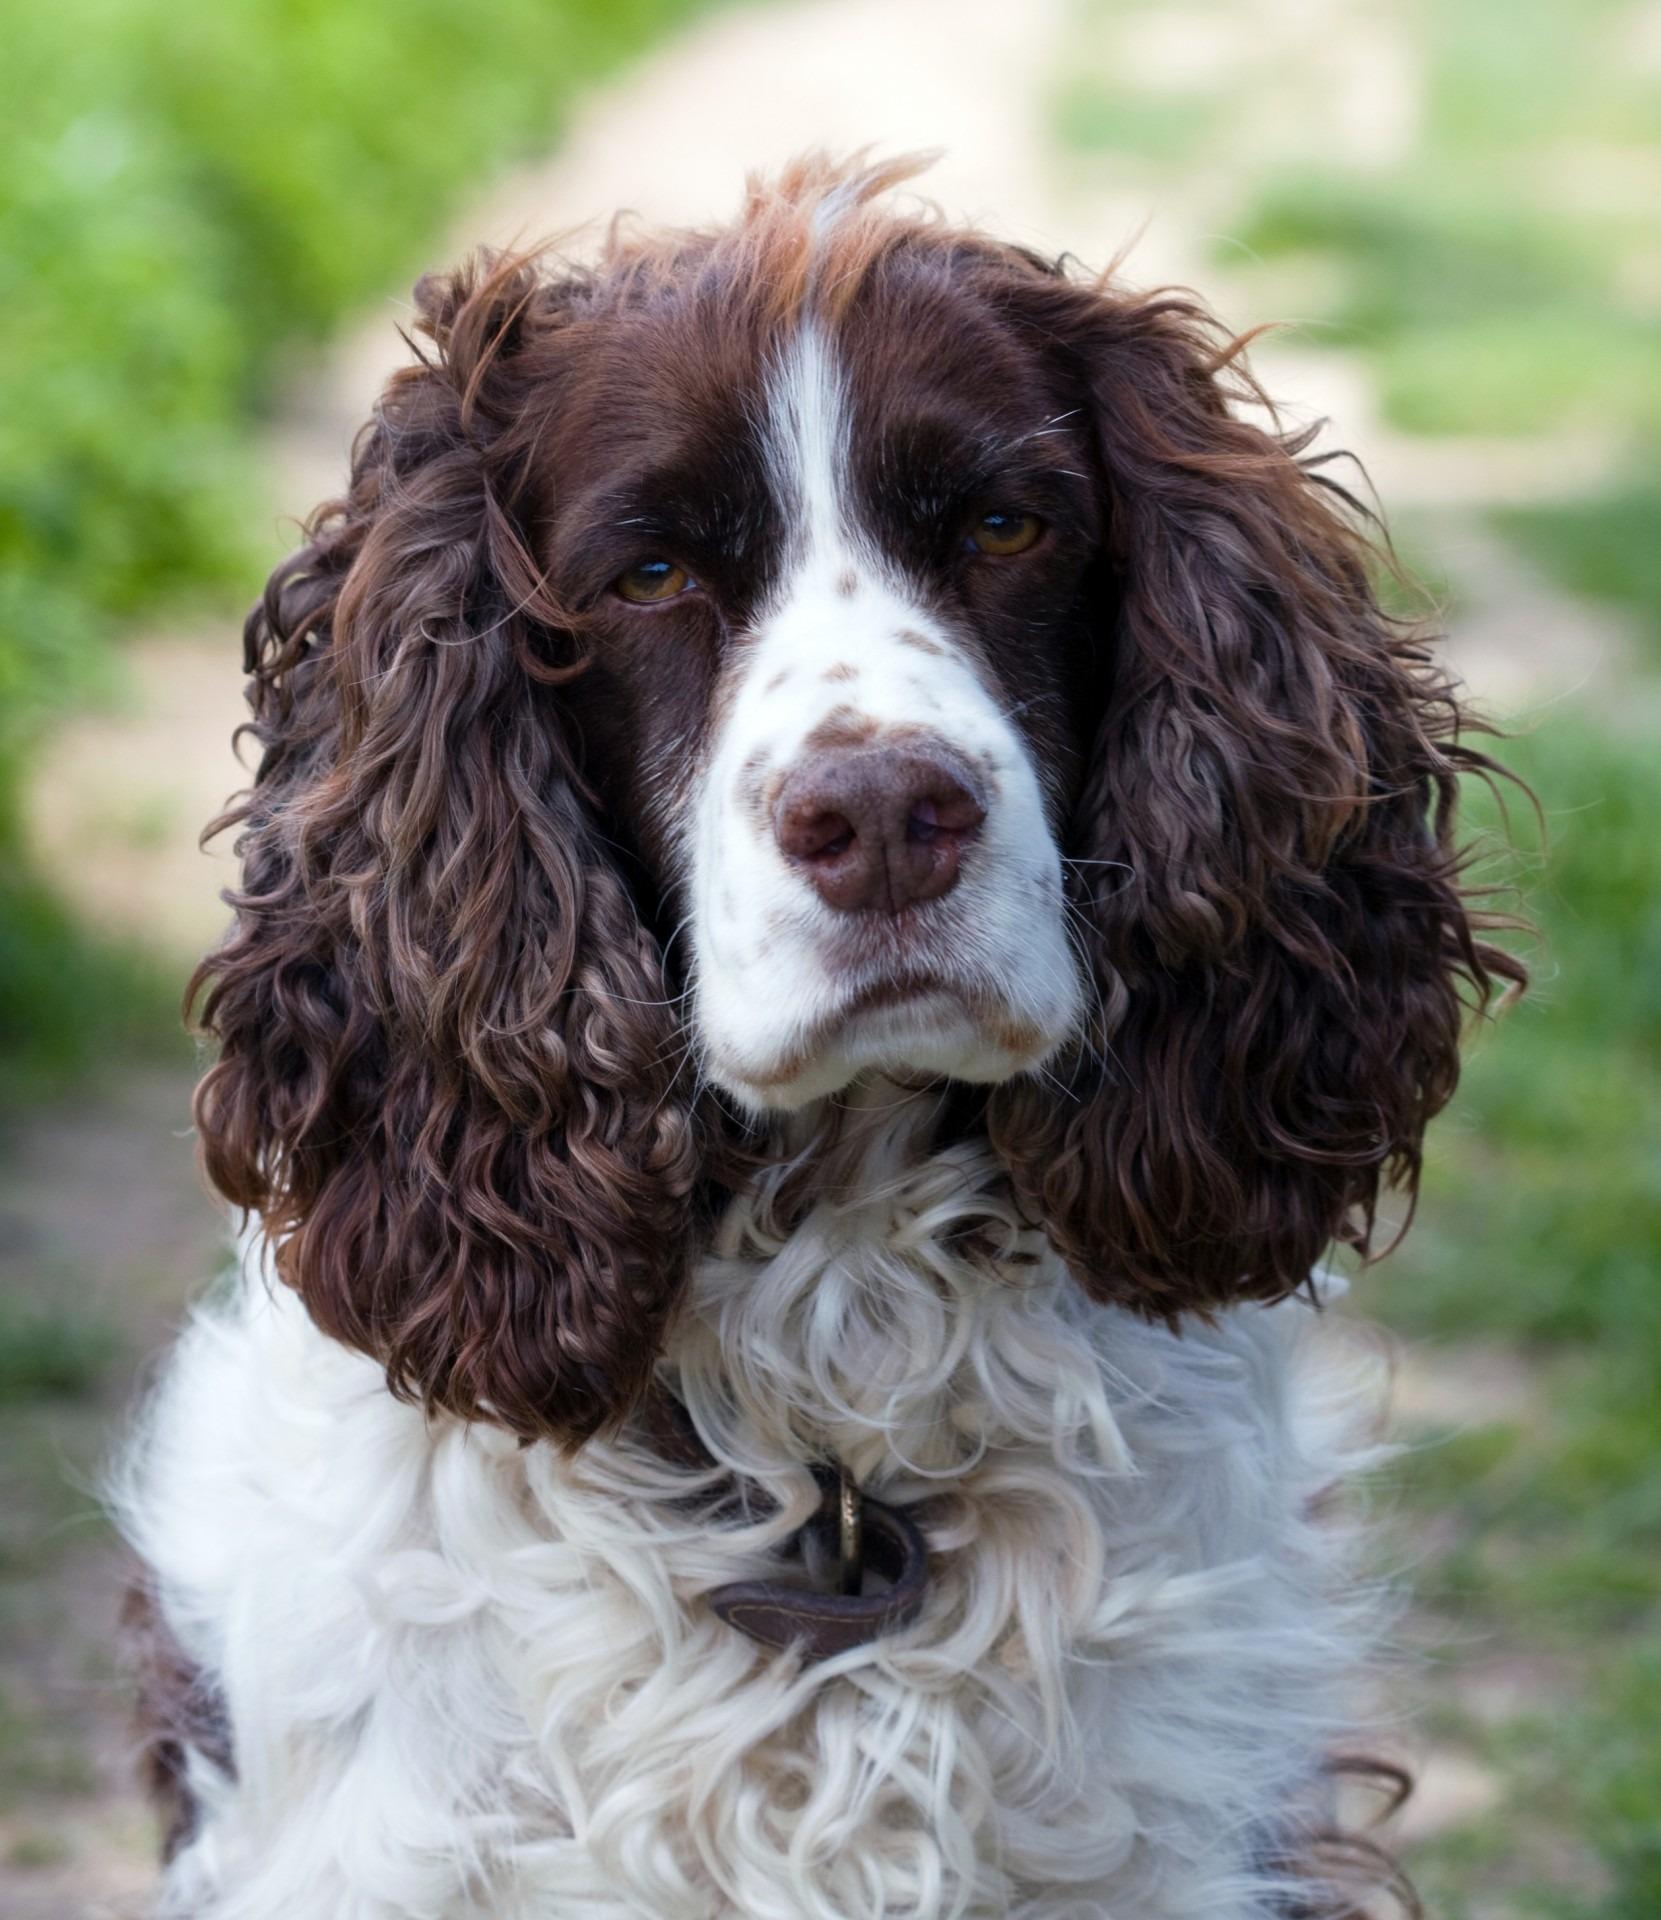 Free Images Animal Canine Photo Pet Portrait Close Up Face